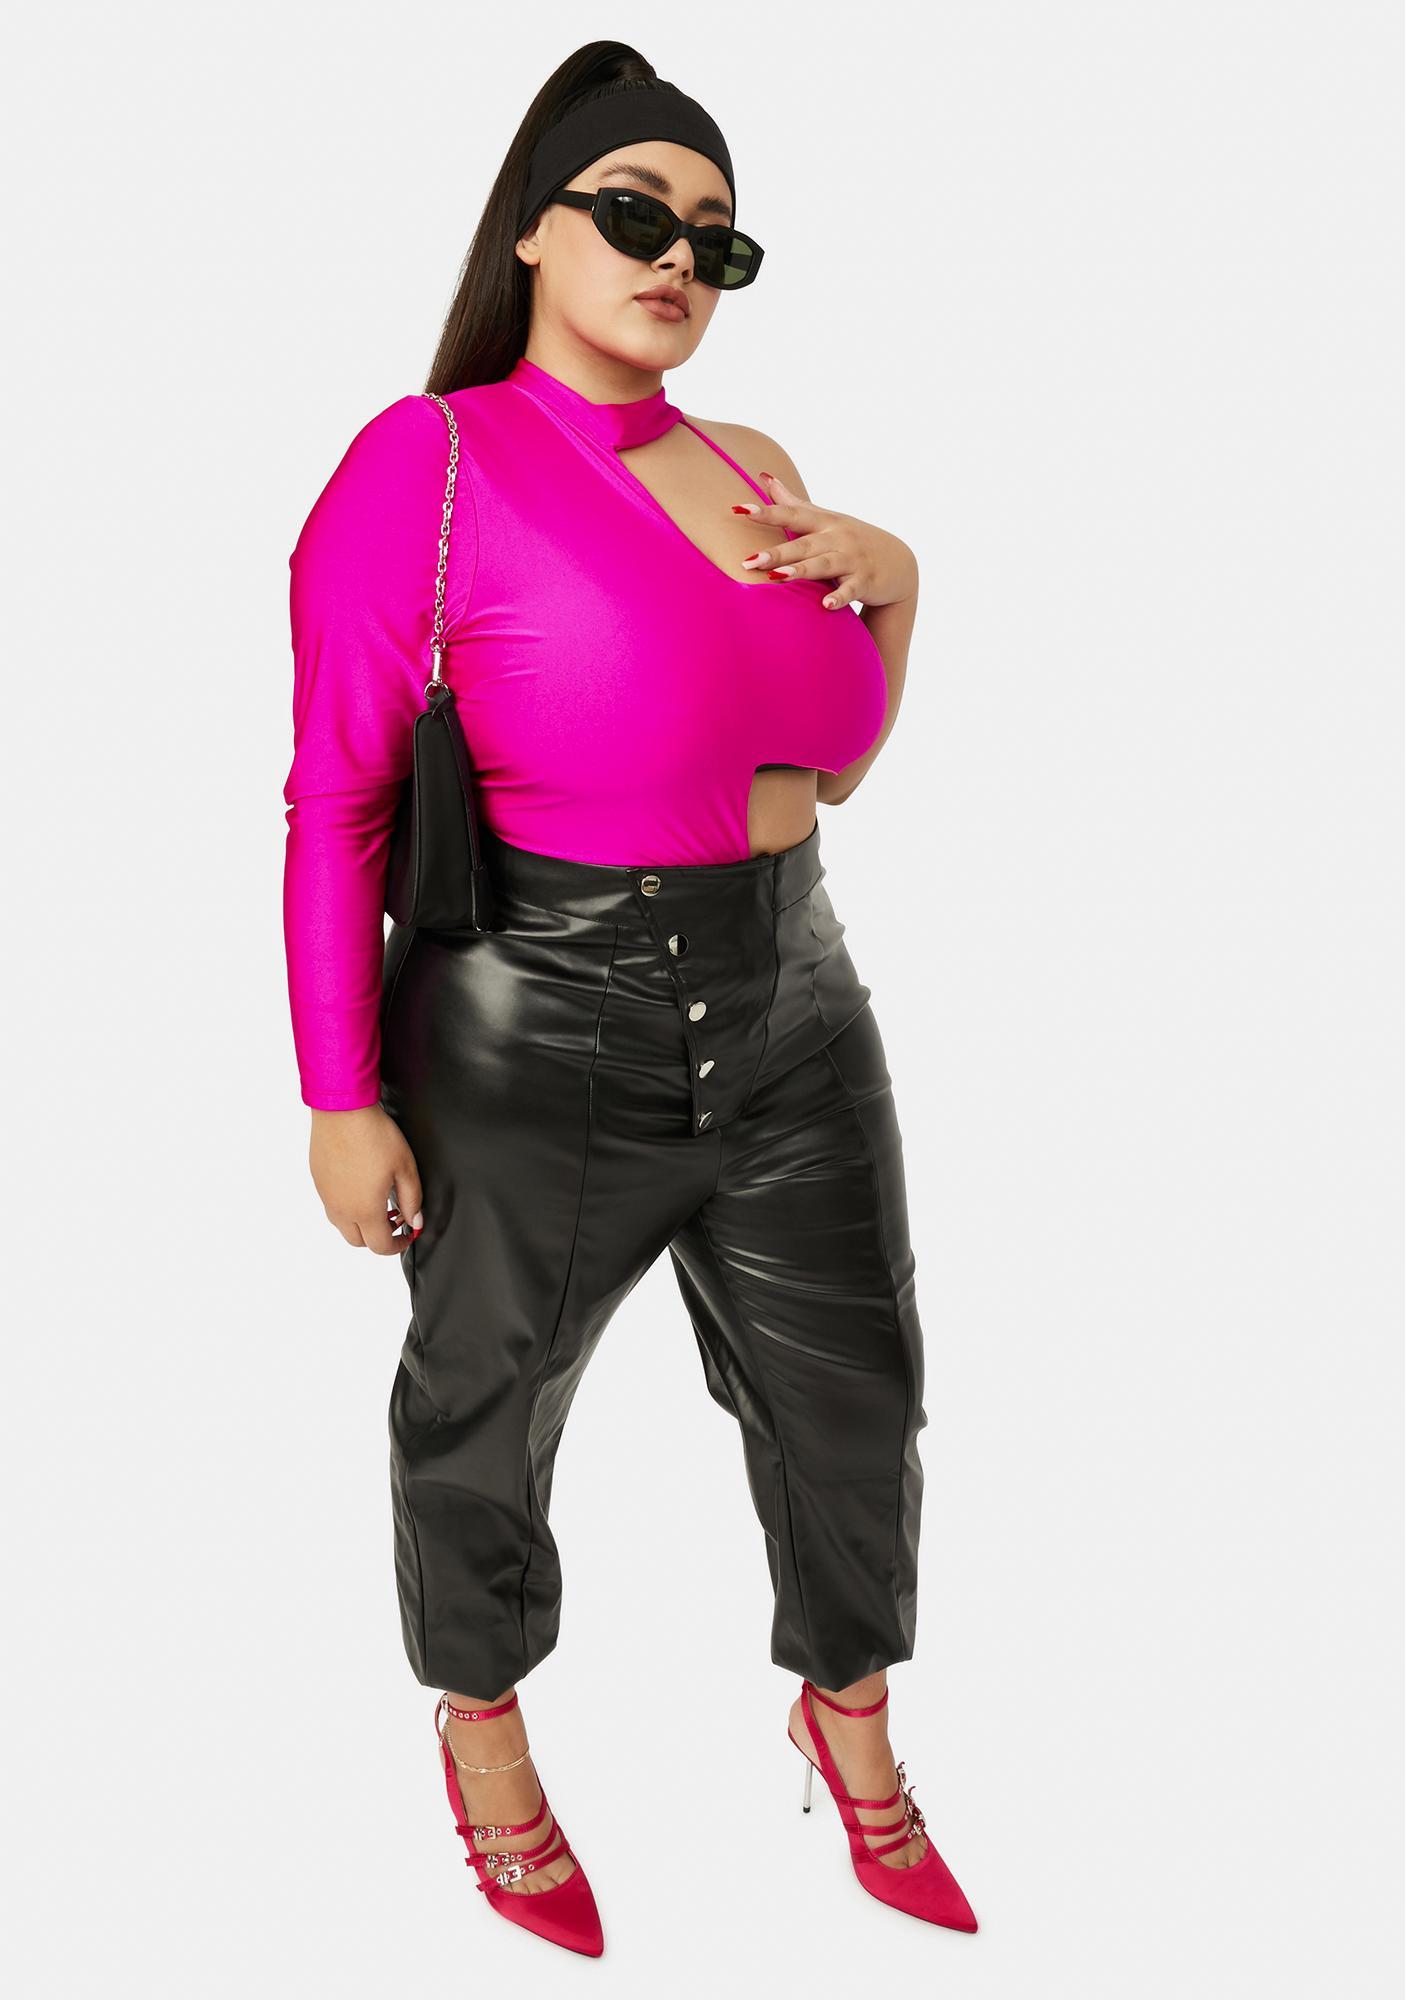 Magenta Always Hella Moods Cut-Out Bodysuit